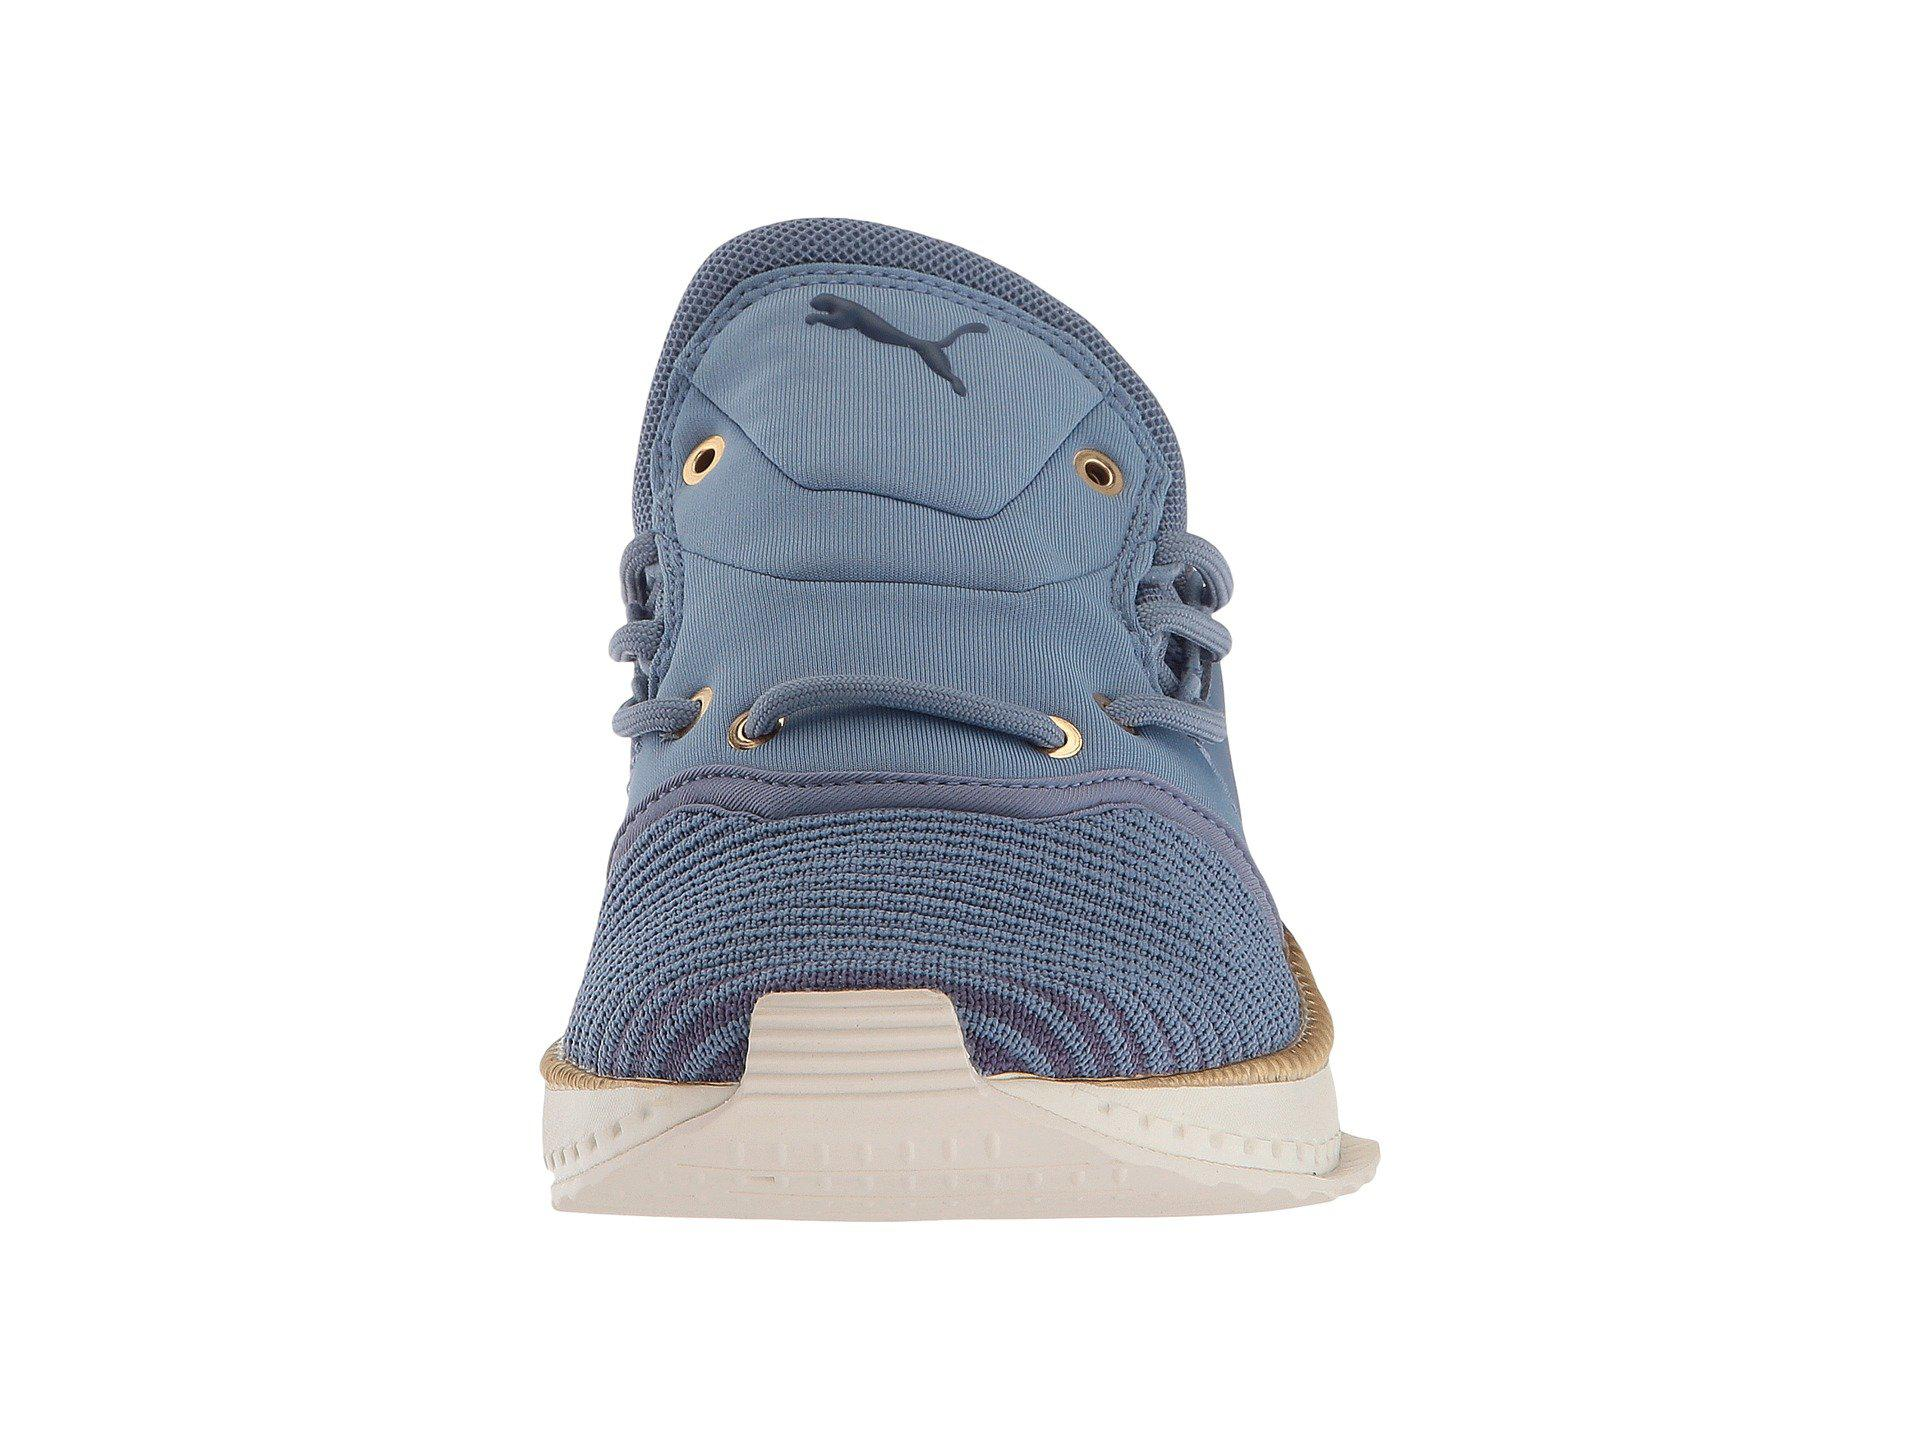 b9bb15d18e2 Lyst - Puma Tsugi Shinsei Evoknit in Blue for Men